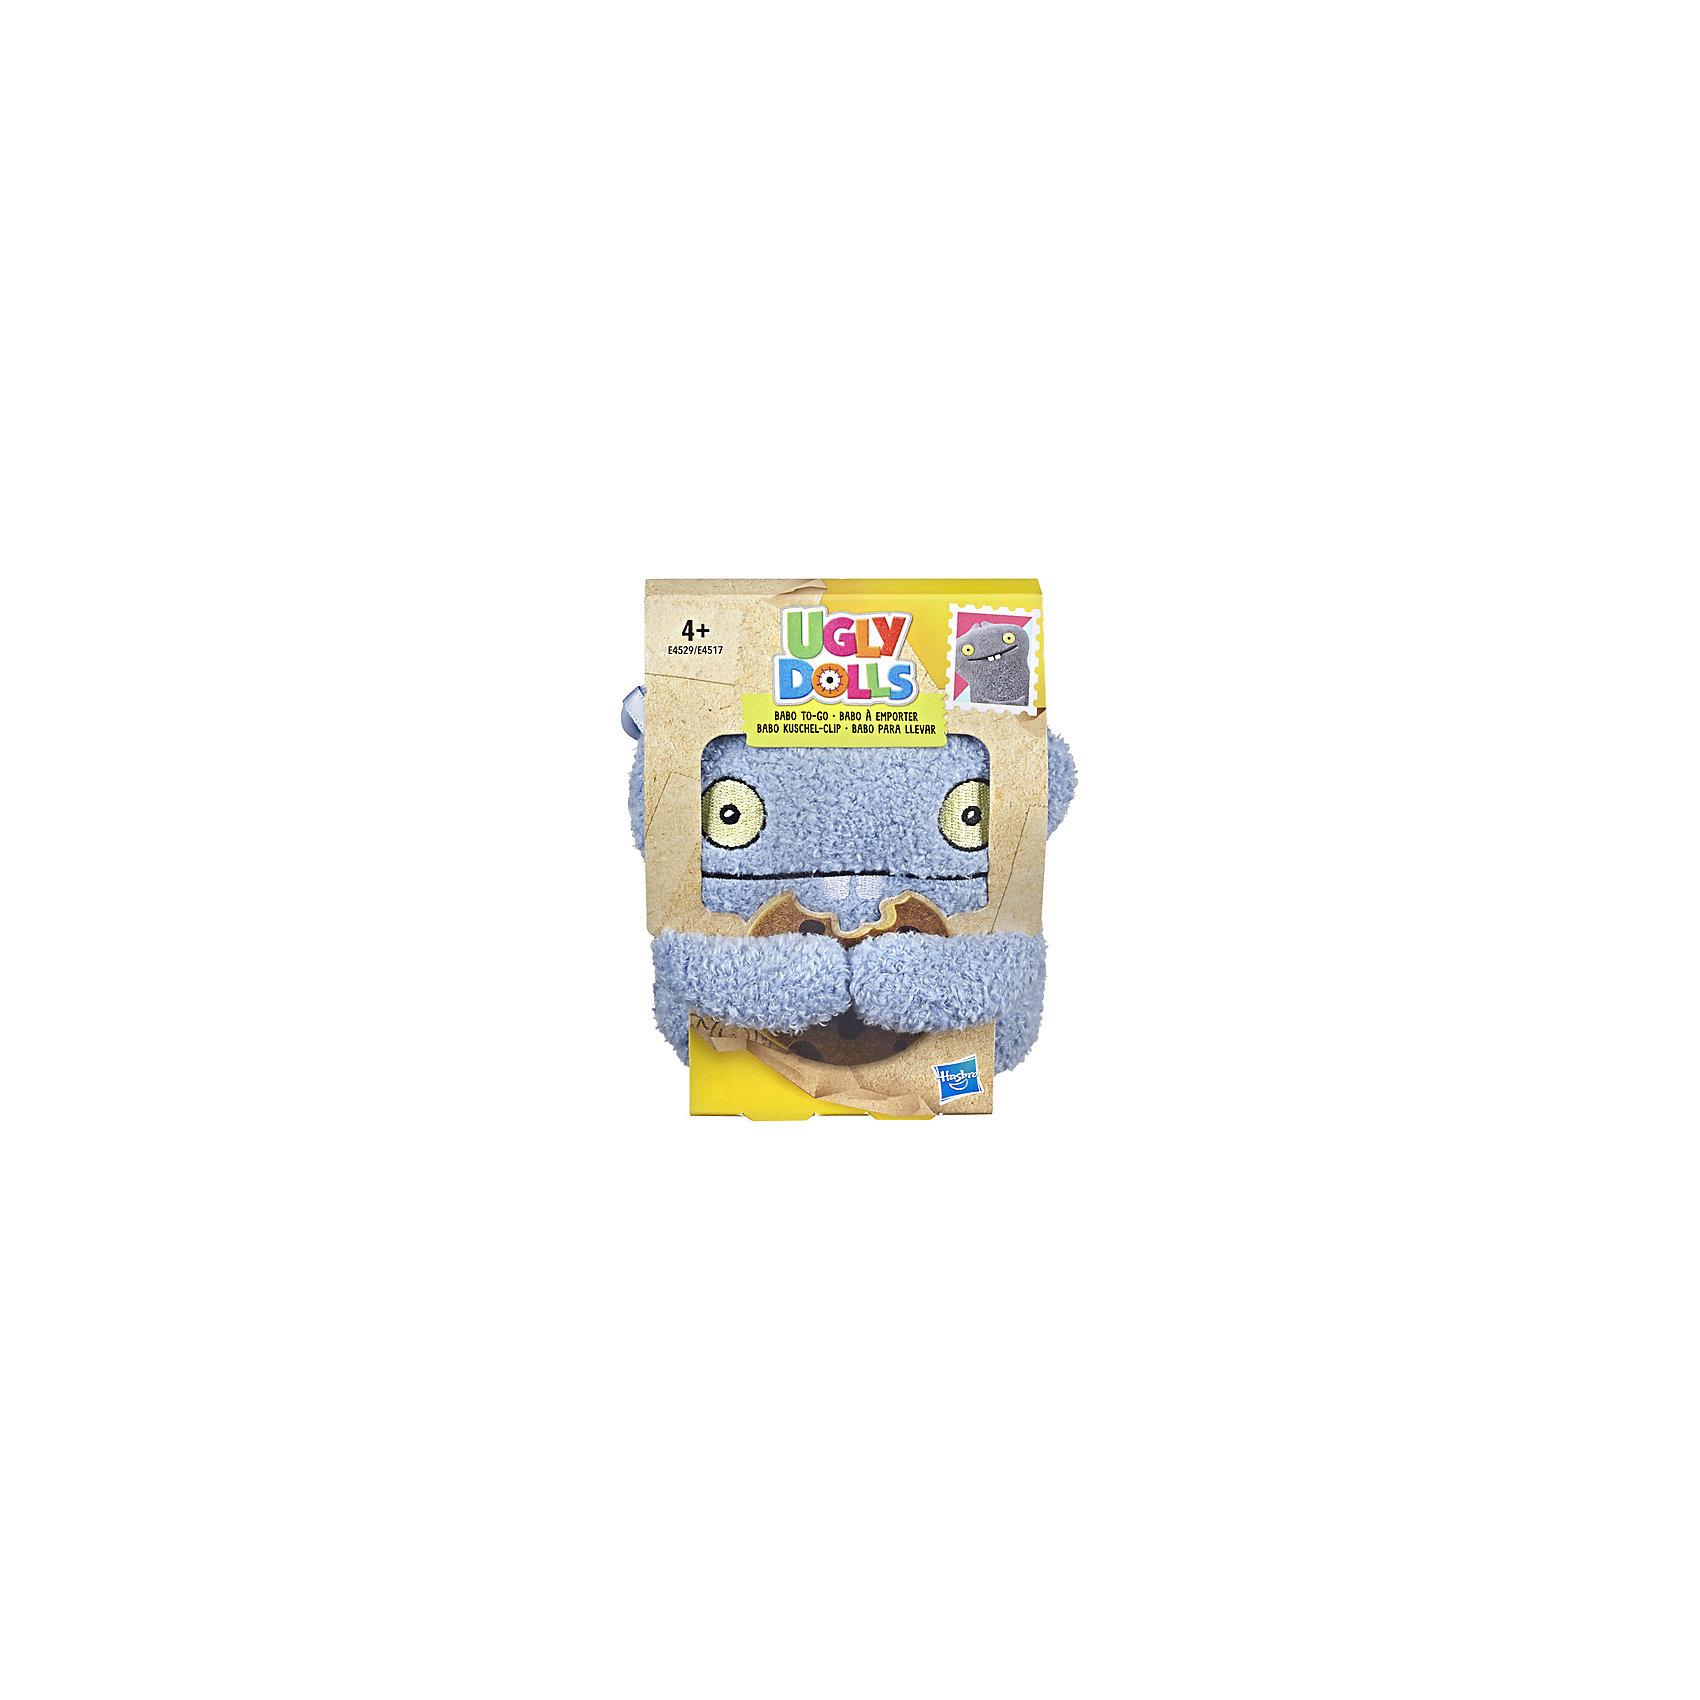 Мягкая игрушка-брелок Ugly Dolls, Бабо